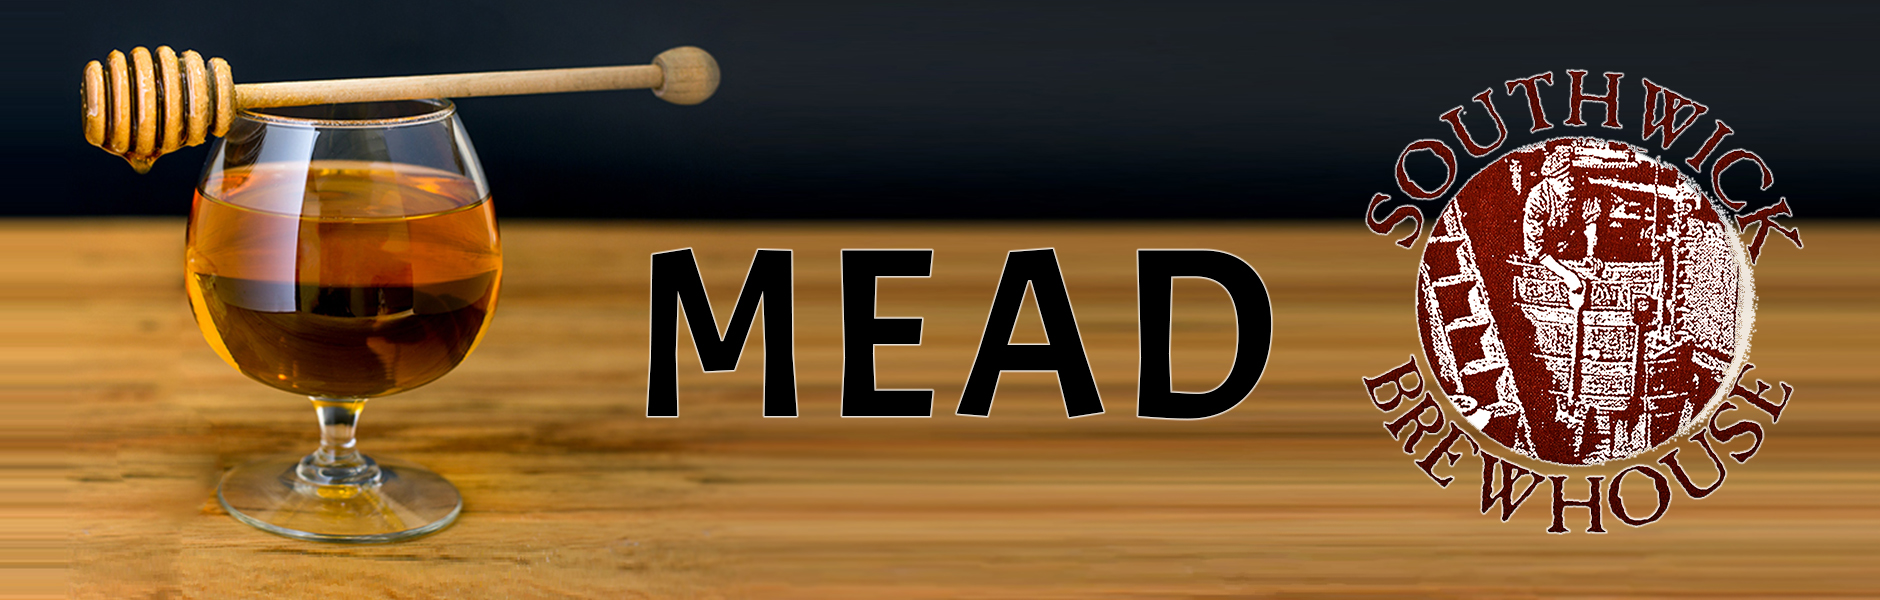 Mead Baner